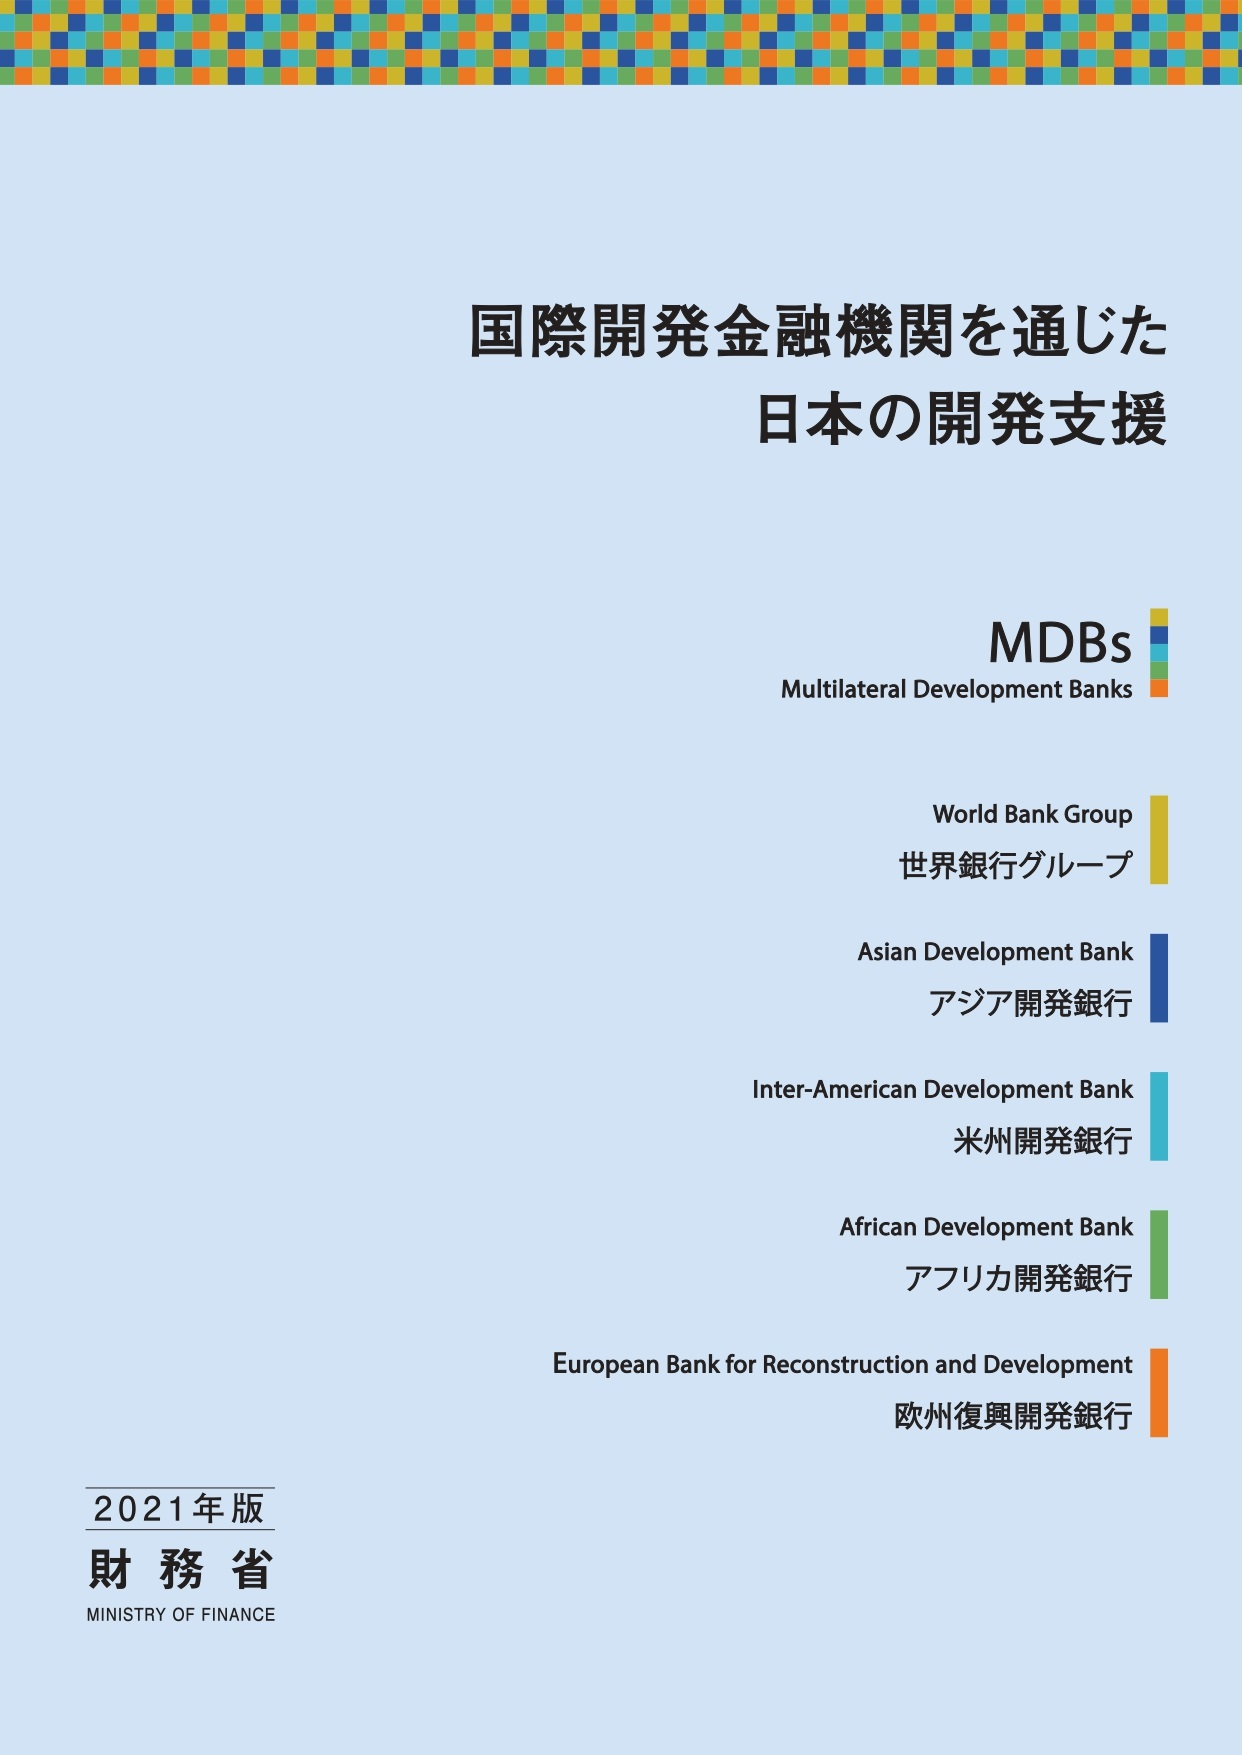 mdbs2021.jpg